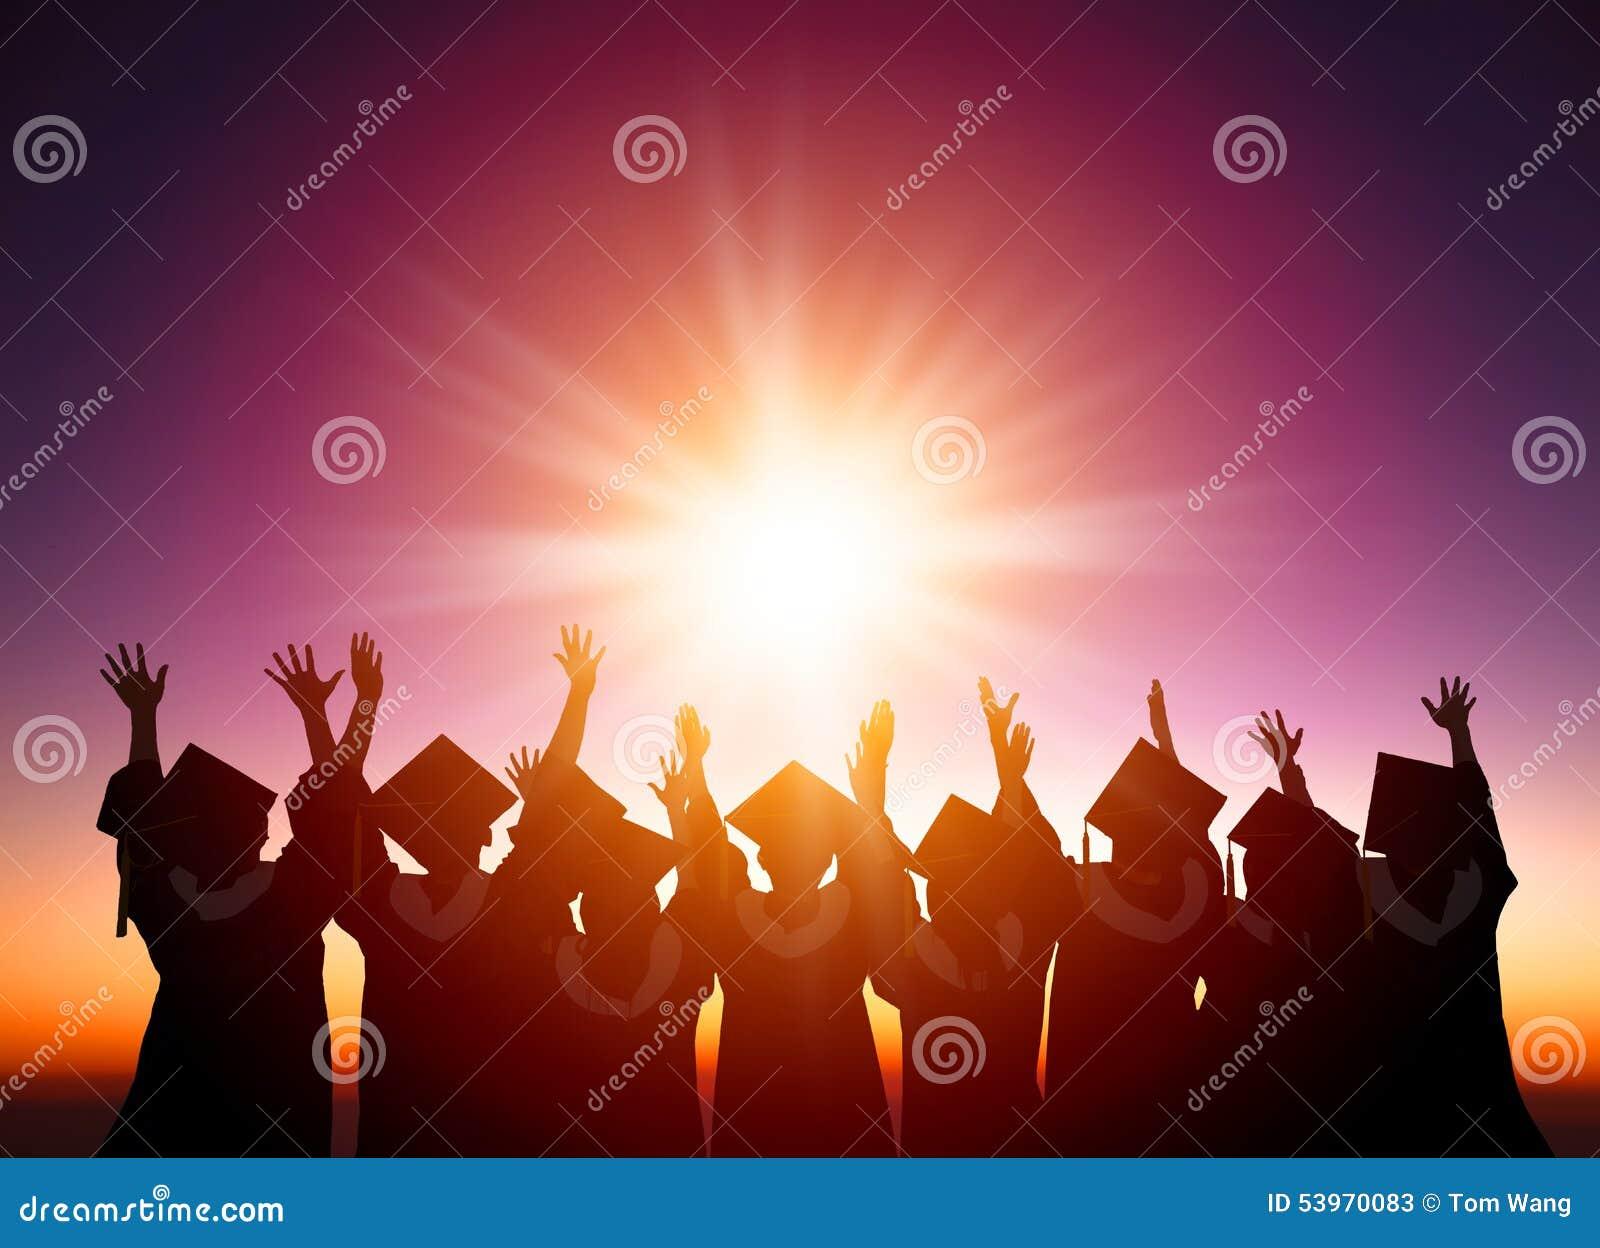 Students Celebrating Graduation watching the sunli